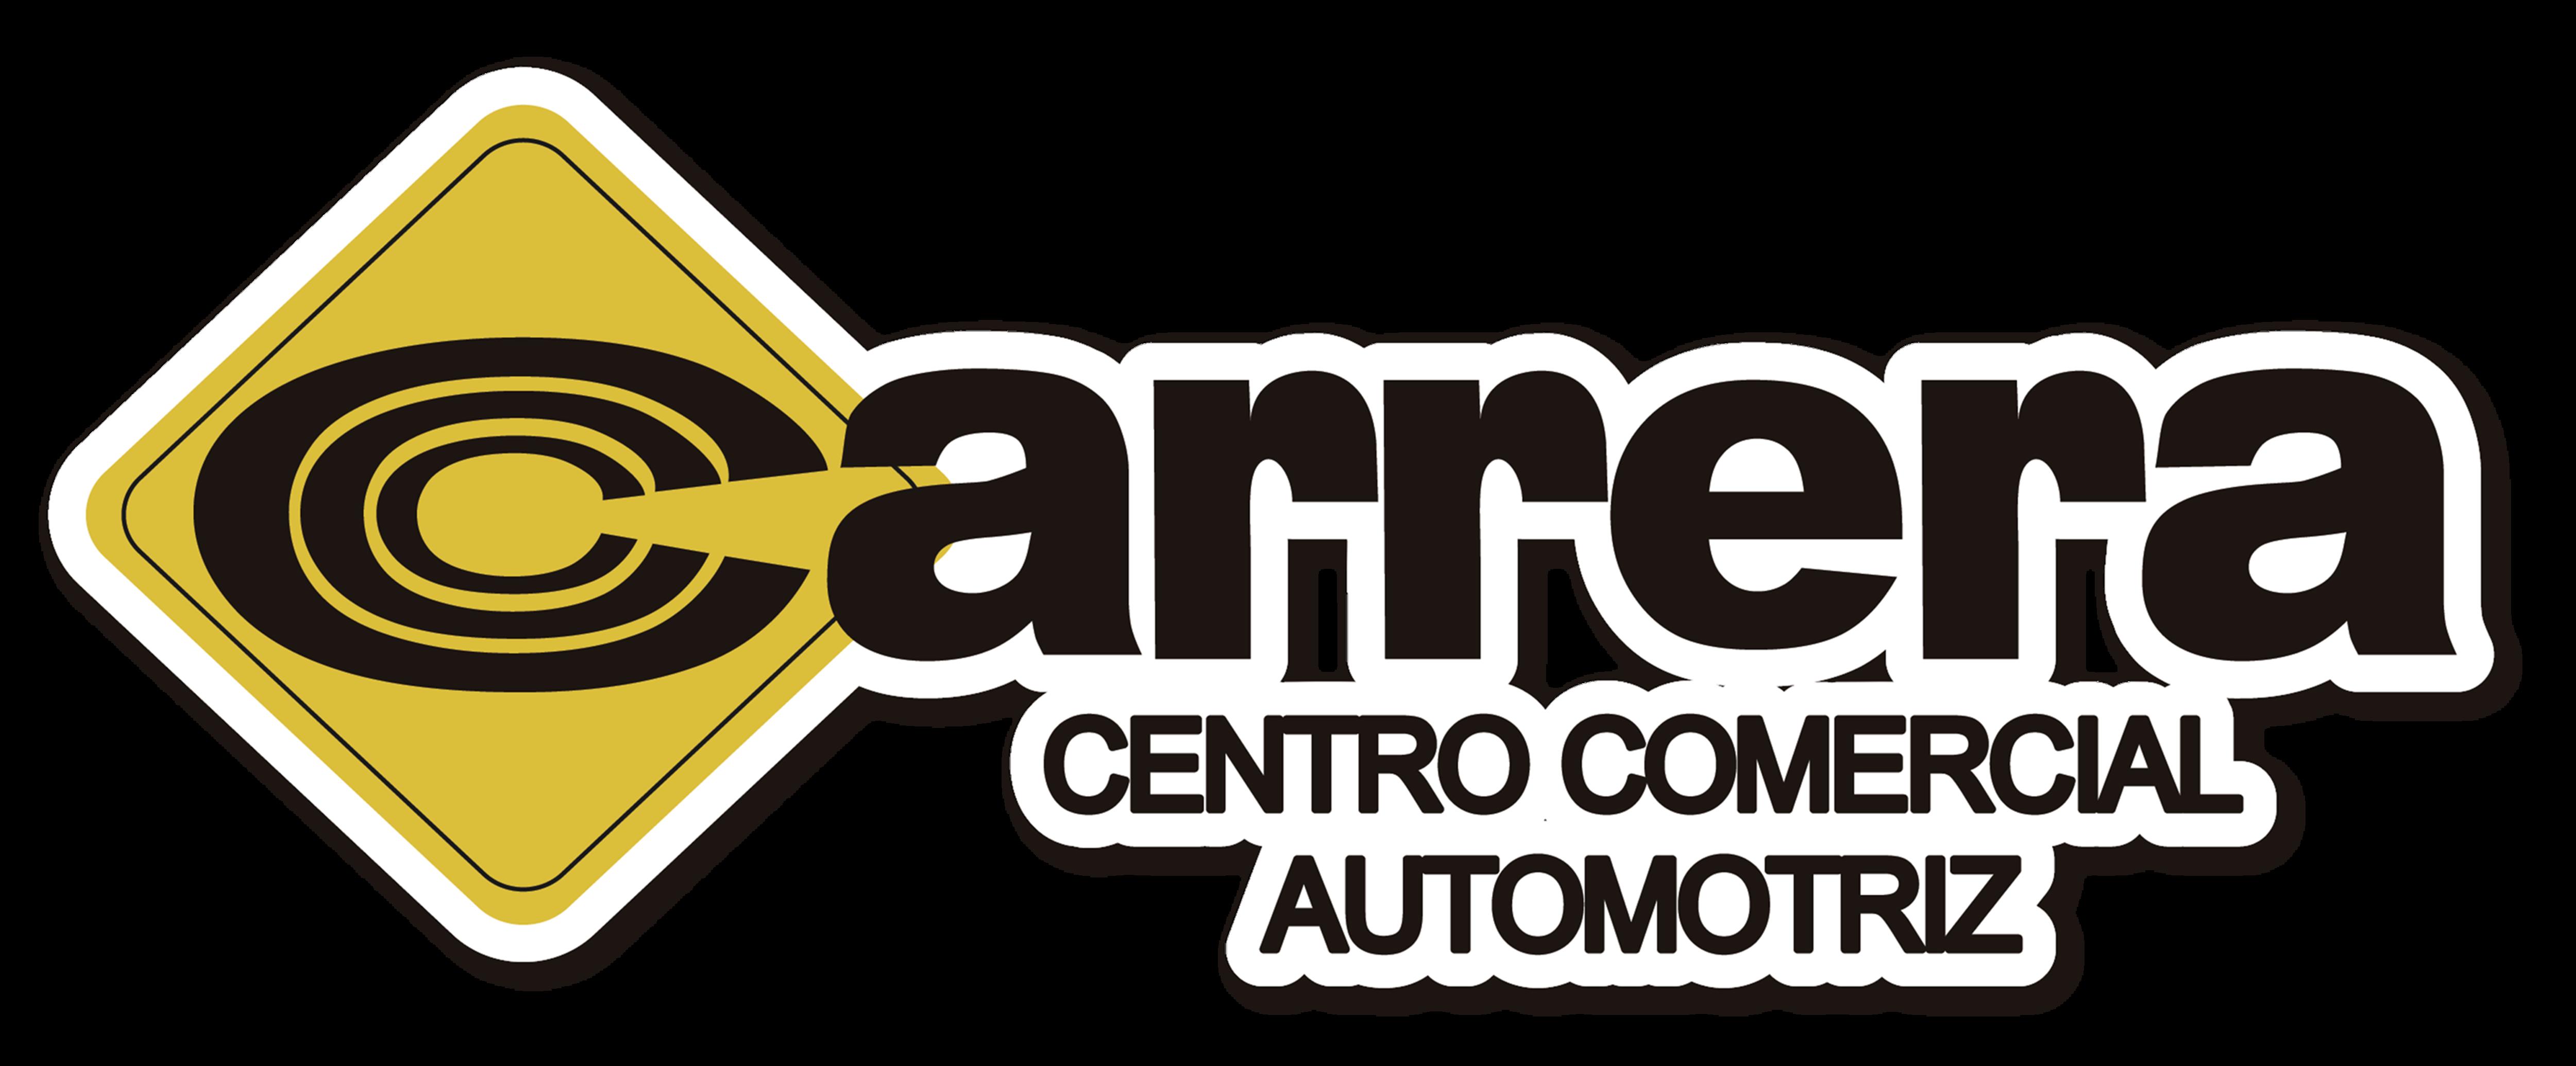 Centro Comercial Carrera